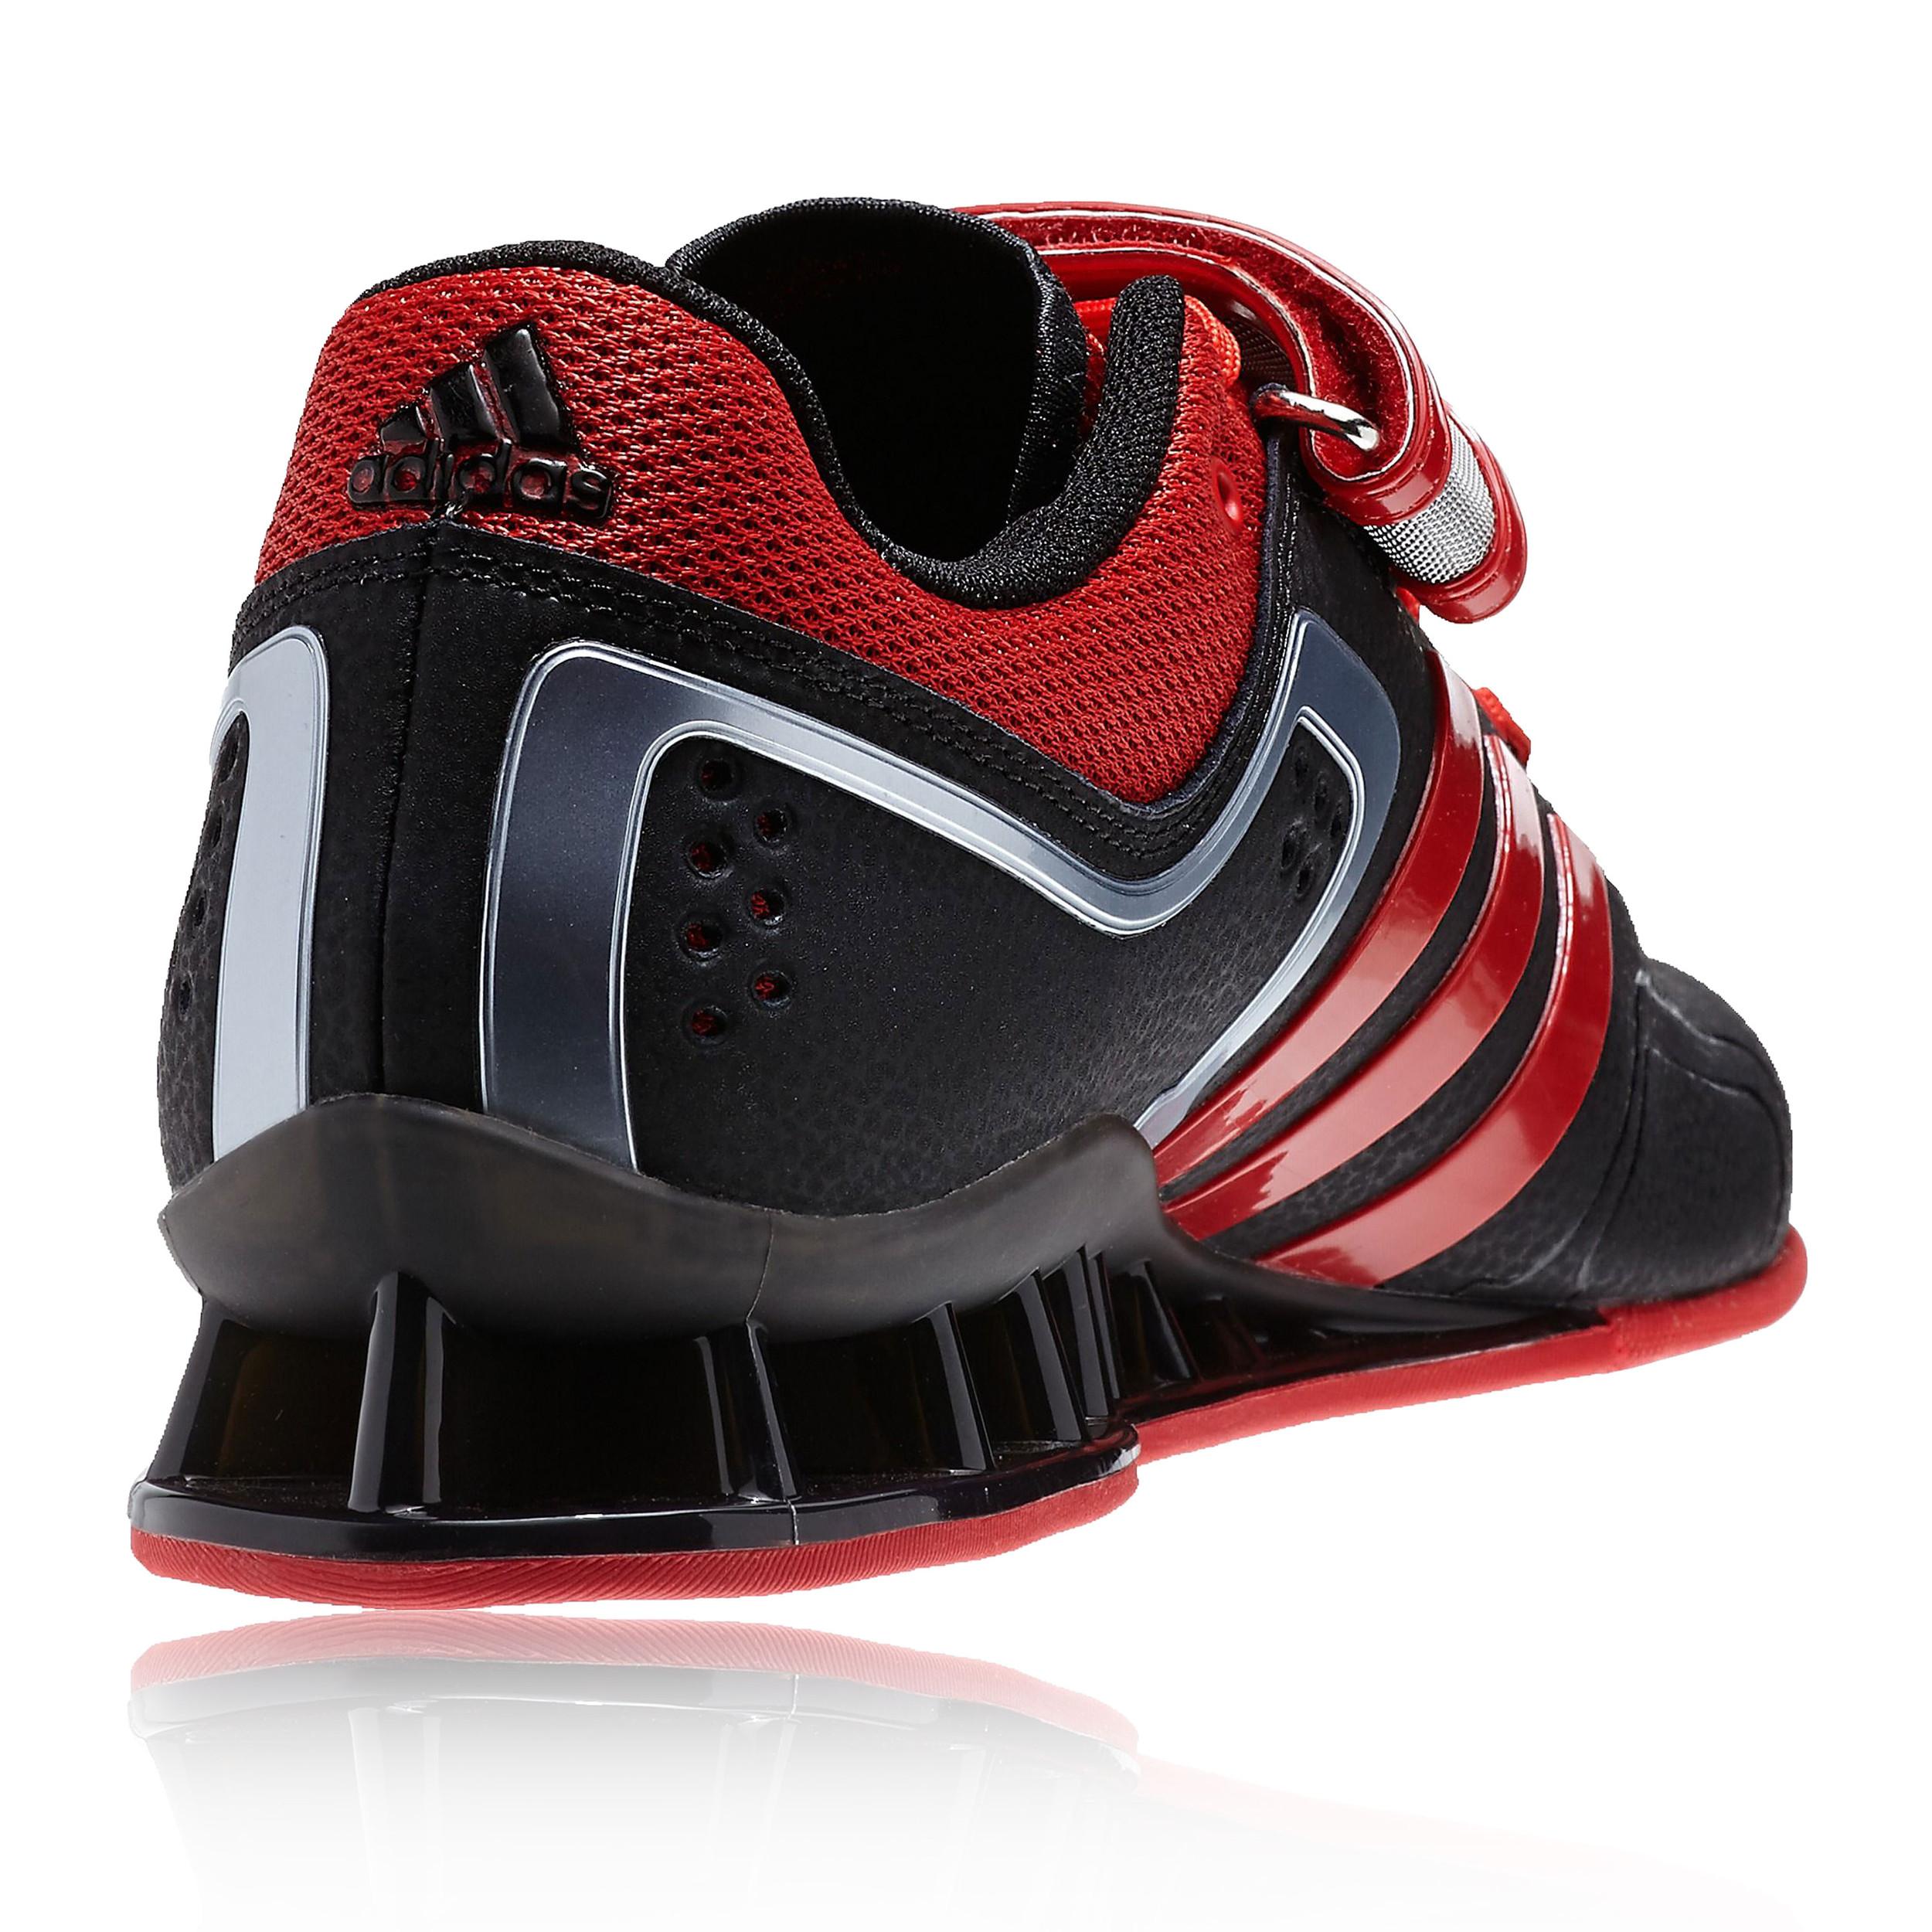 Adidas Adipower Weightlifting Shoes Women